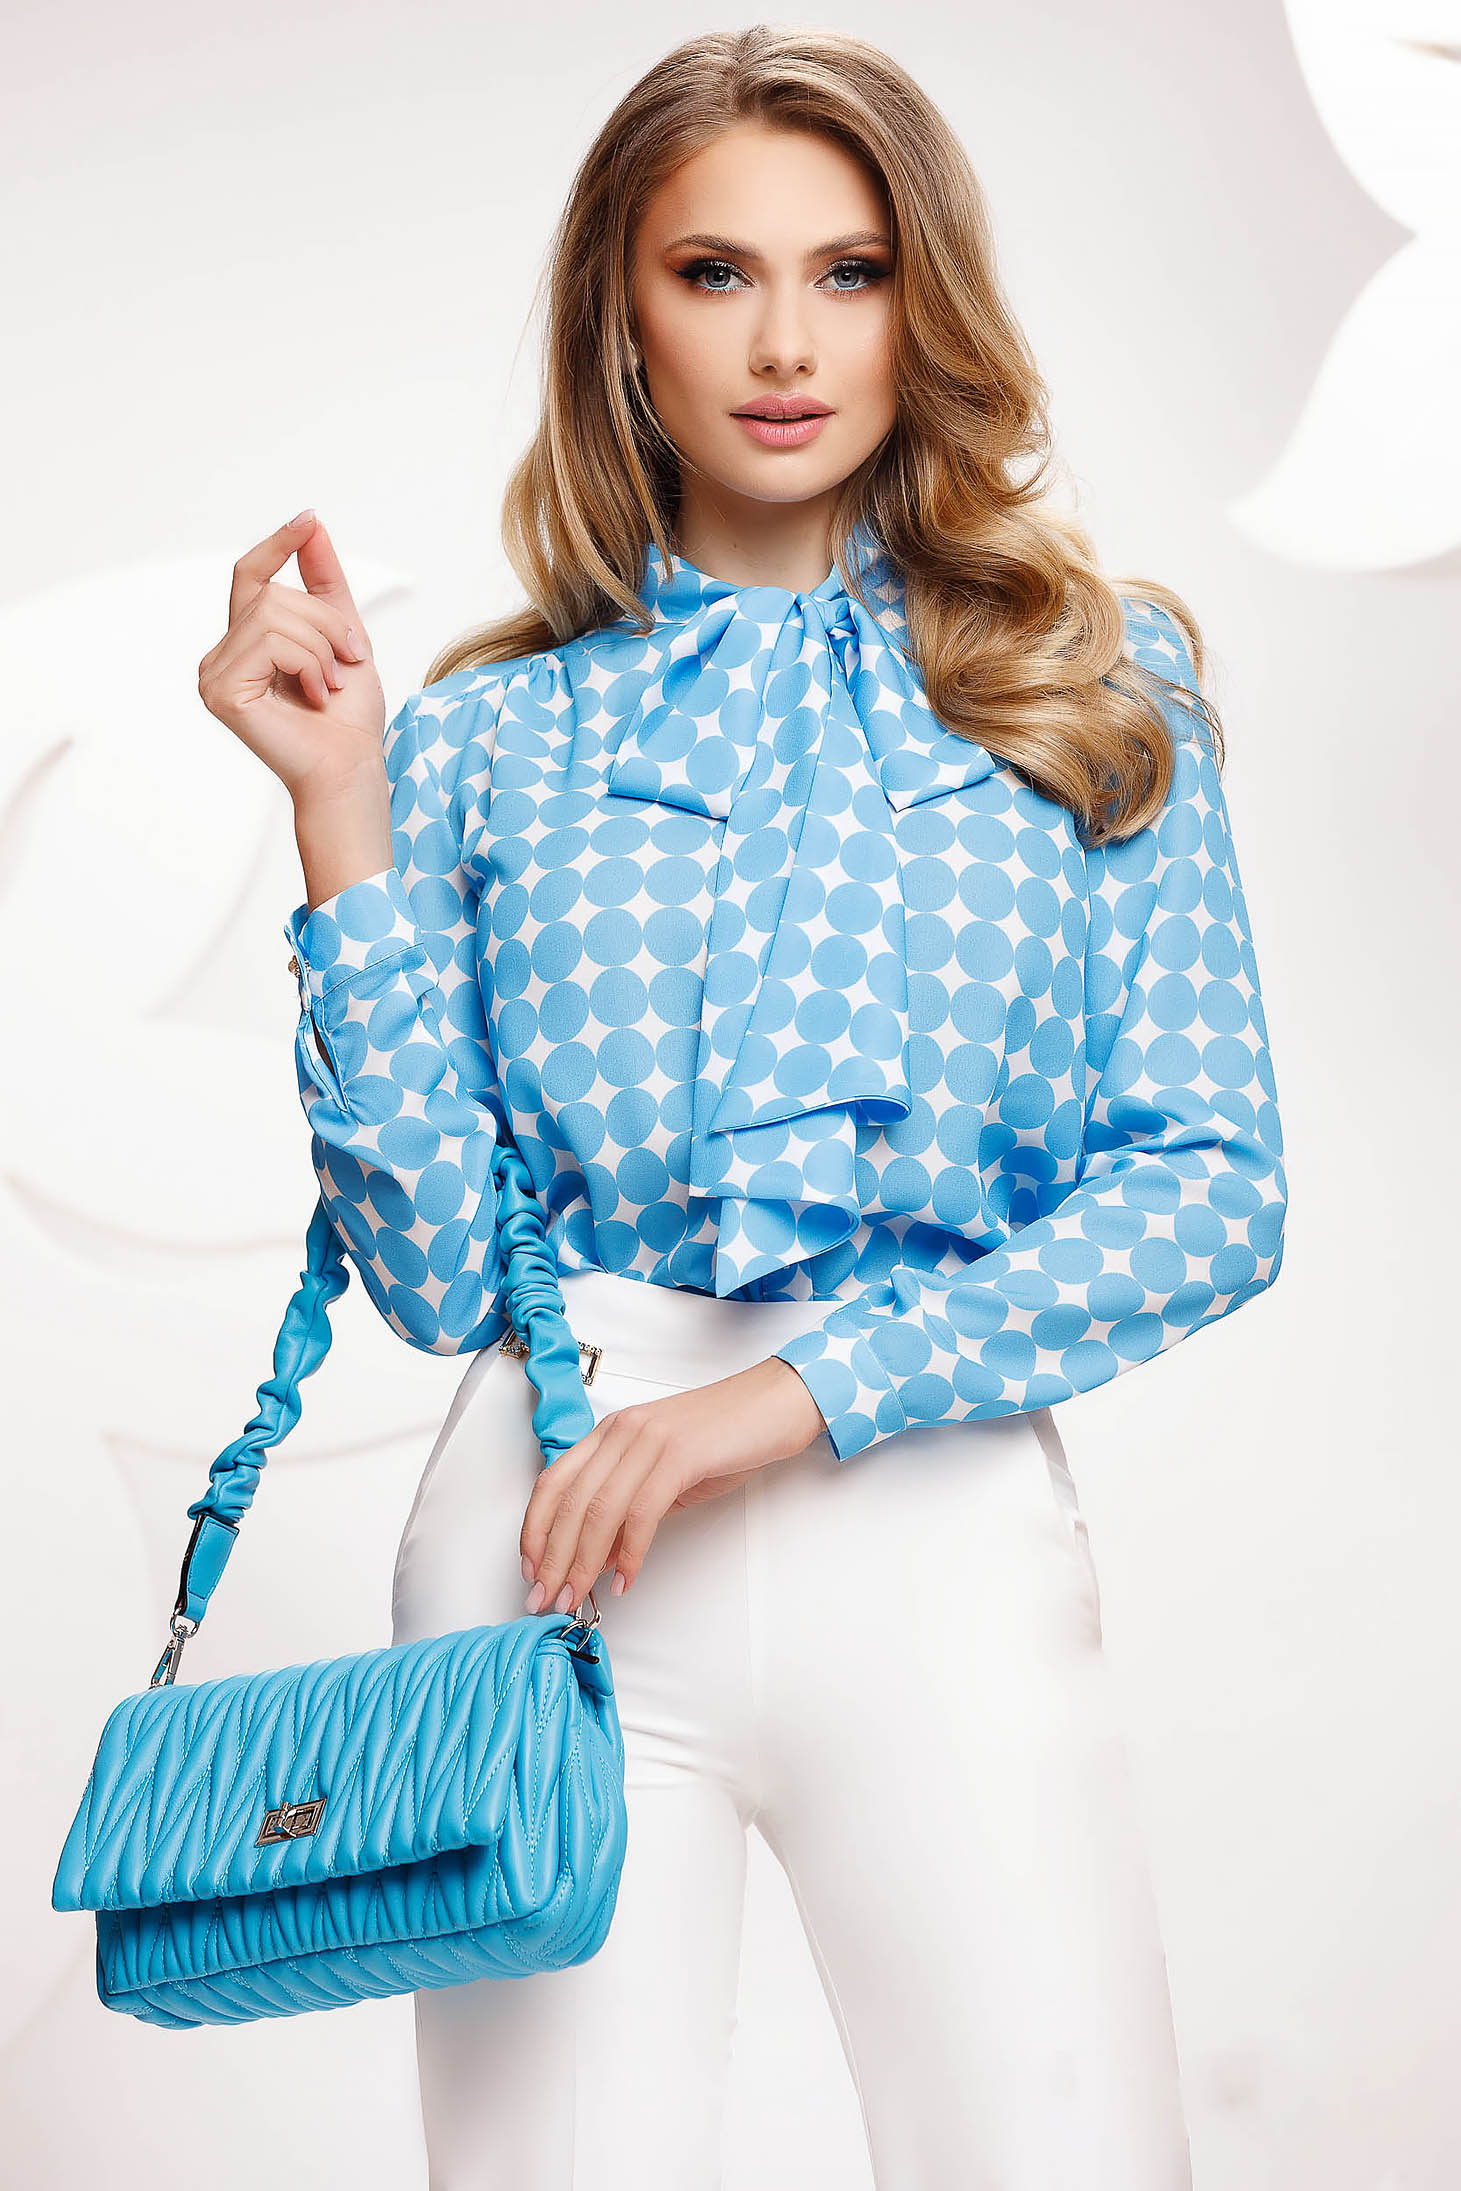 Bluza dama Fofy albastra cu buline din voal cu croi larg care se leaga cu fundita